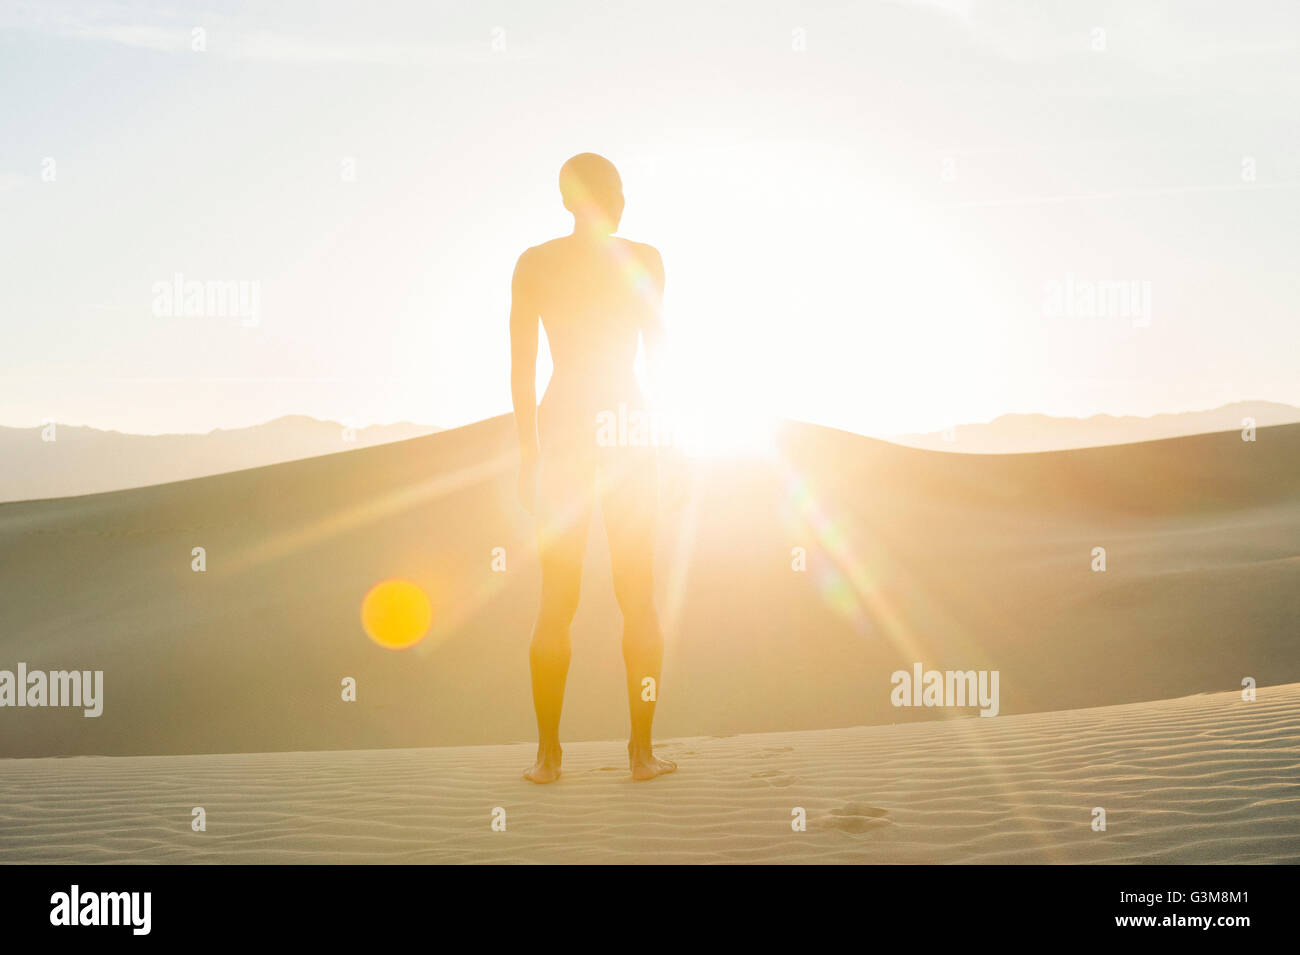 Nude woman in desert standing on dune in sunlight - Stock Image